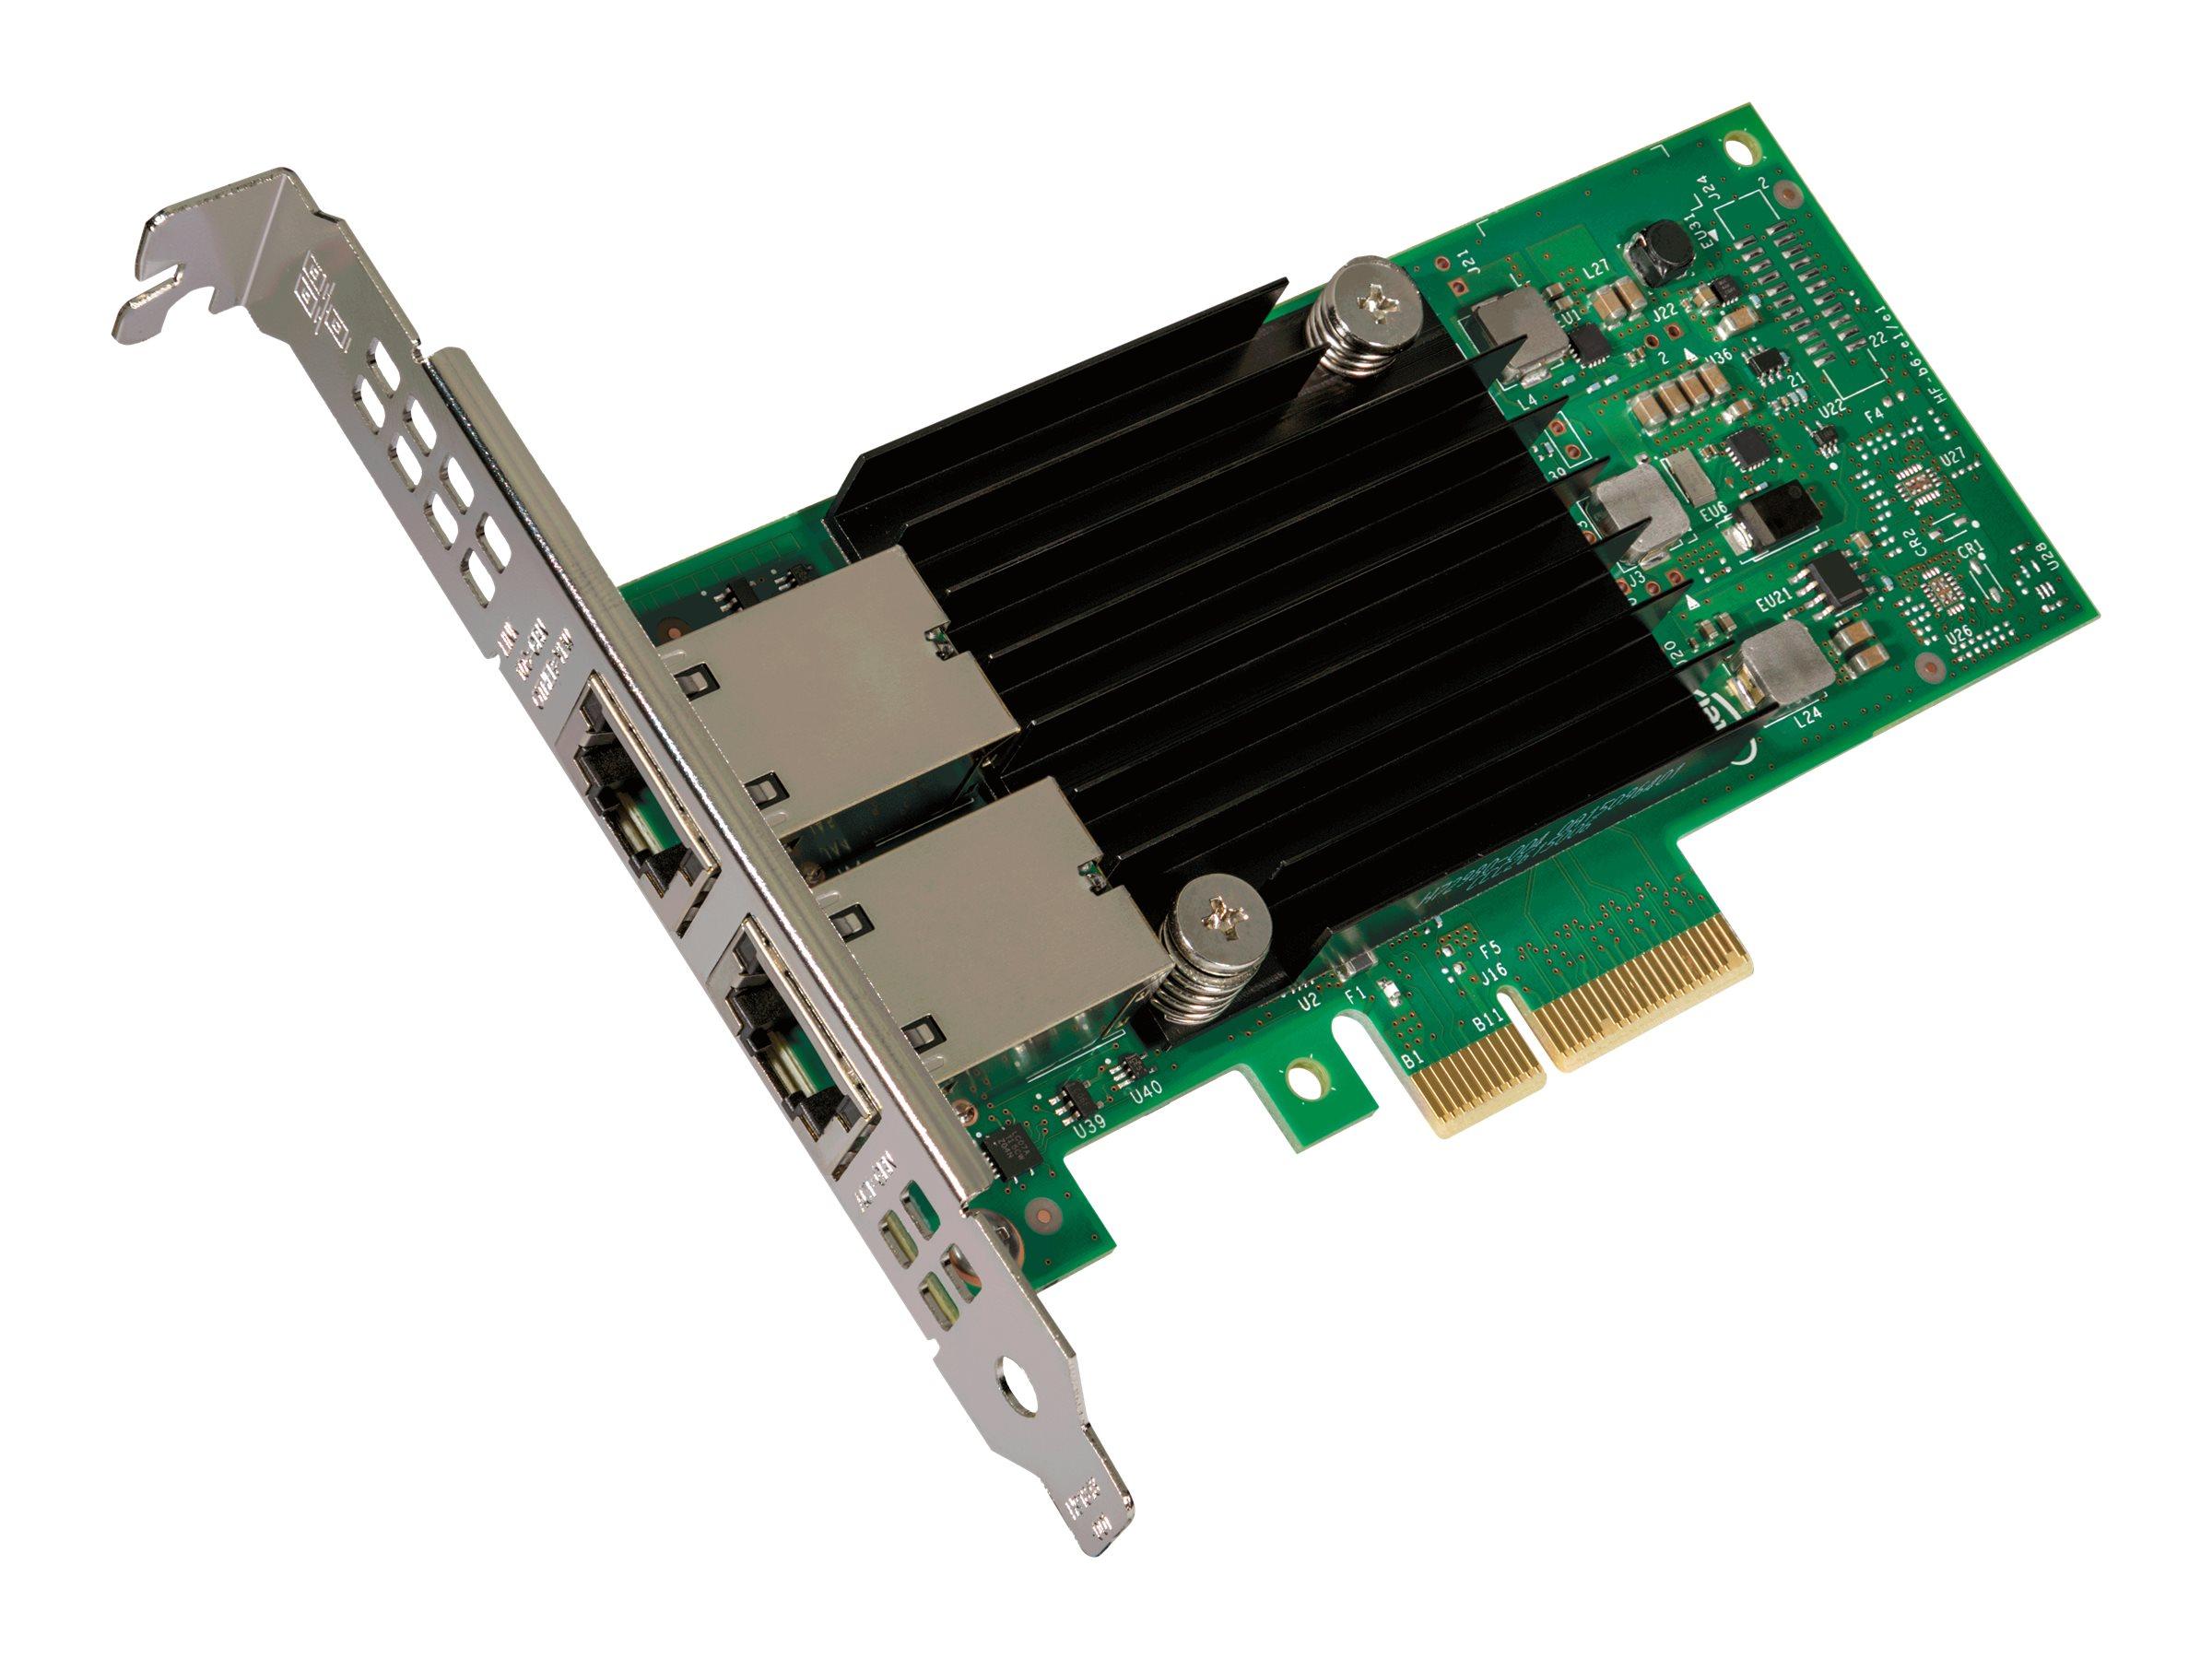 Intel Ethernet Converged Network Adapter X550-T2 - Netzwerkadapter - PCIe 3.0 x4 Low-Profile - 10Gb Ethernet x 2